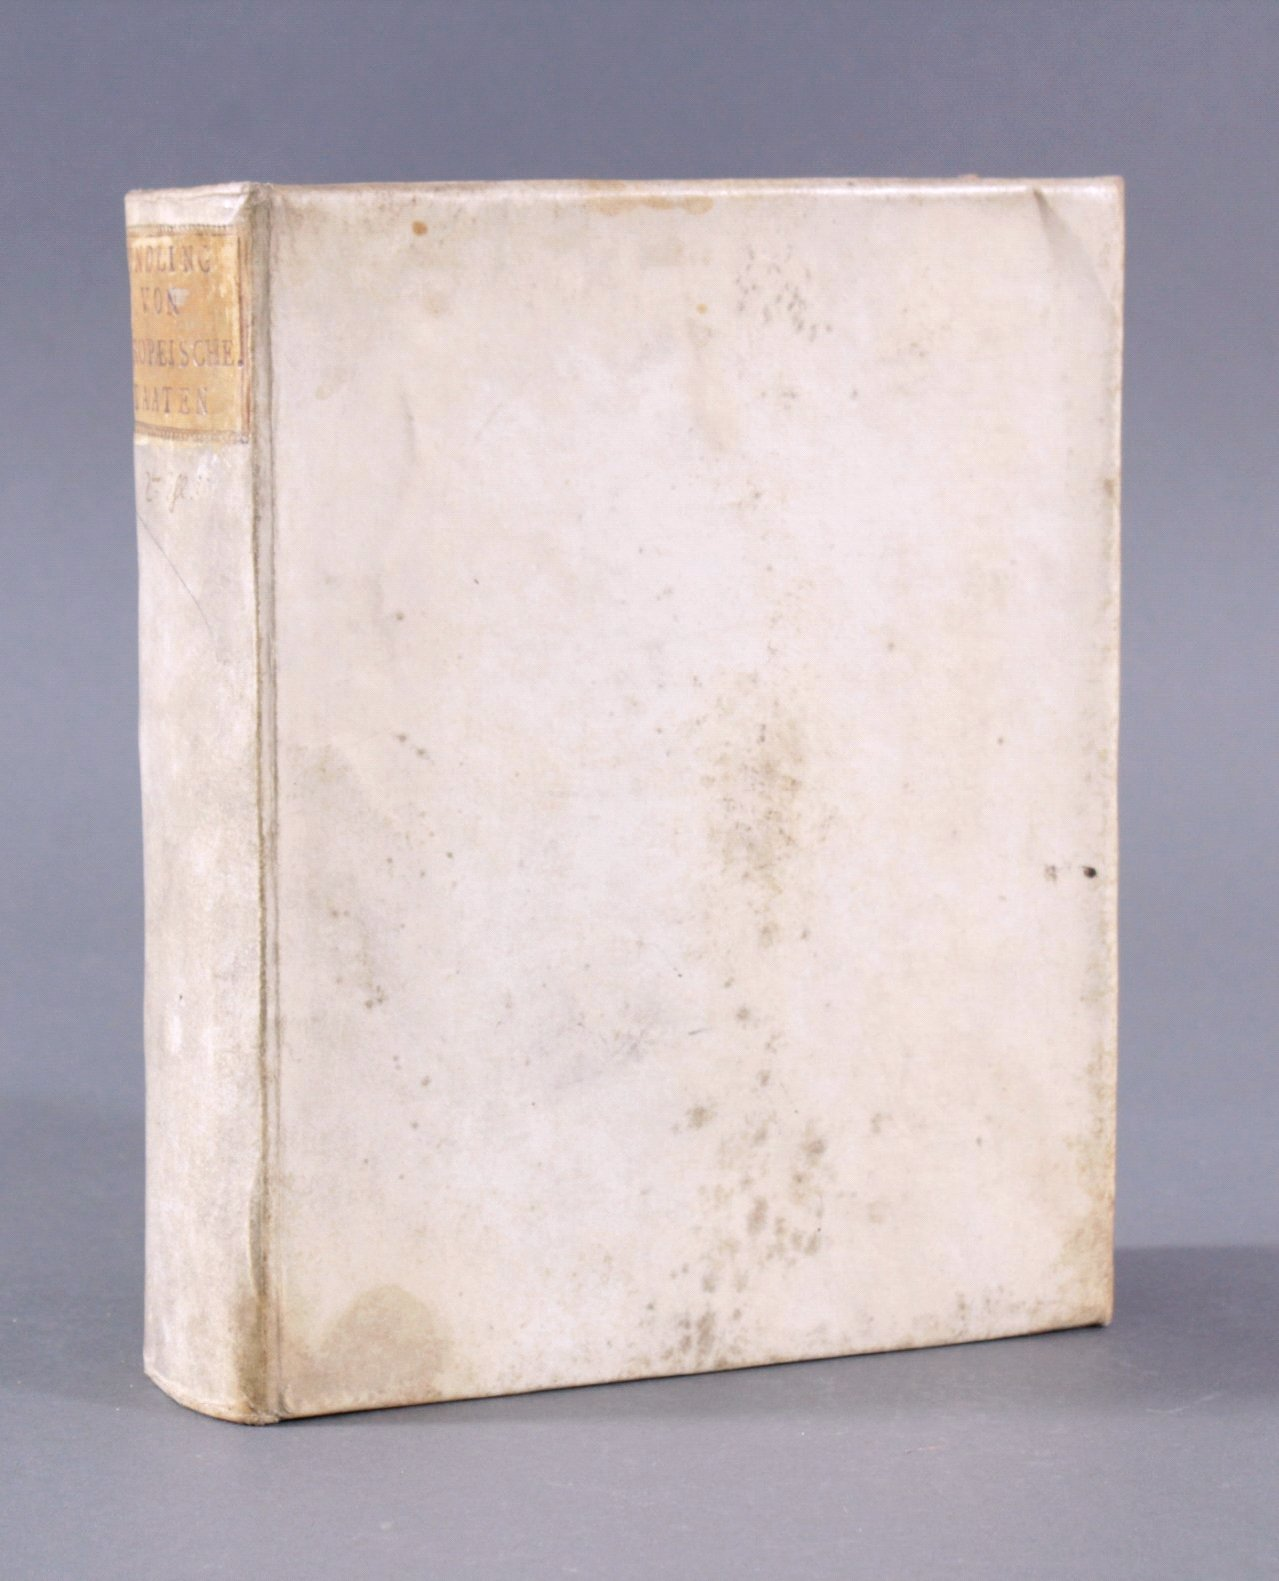 D. Nic. Hier Gundlings Discours, 1734